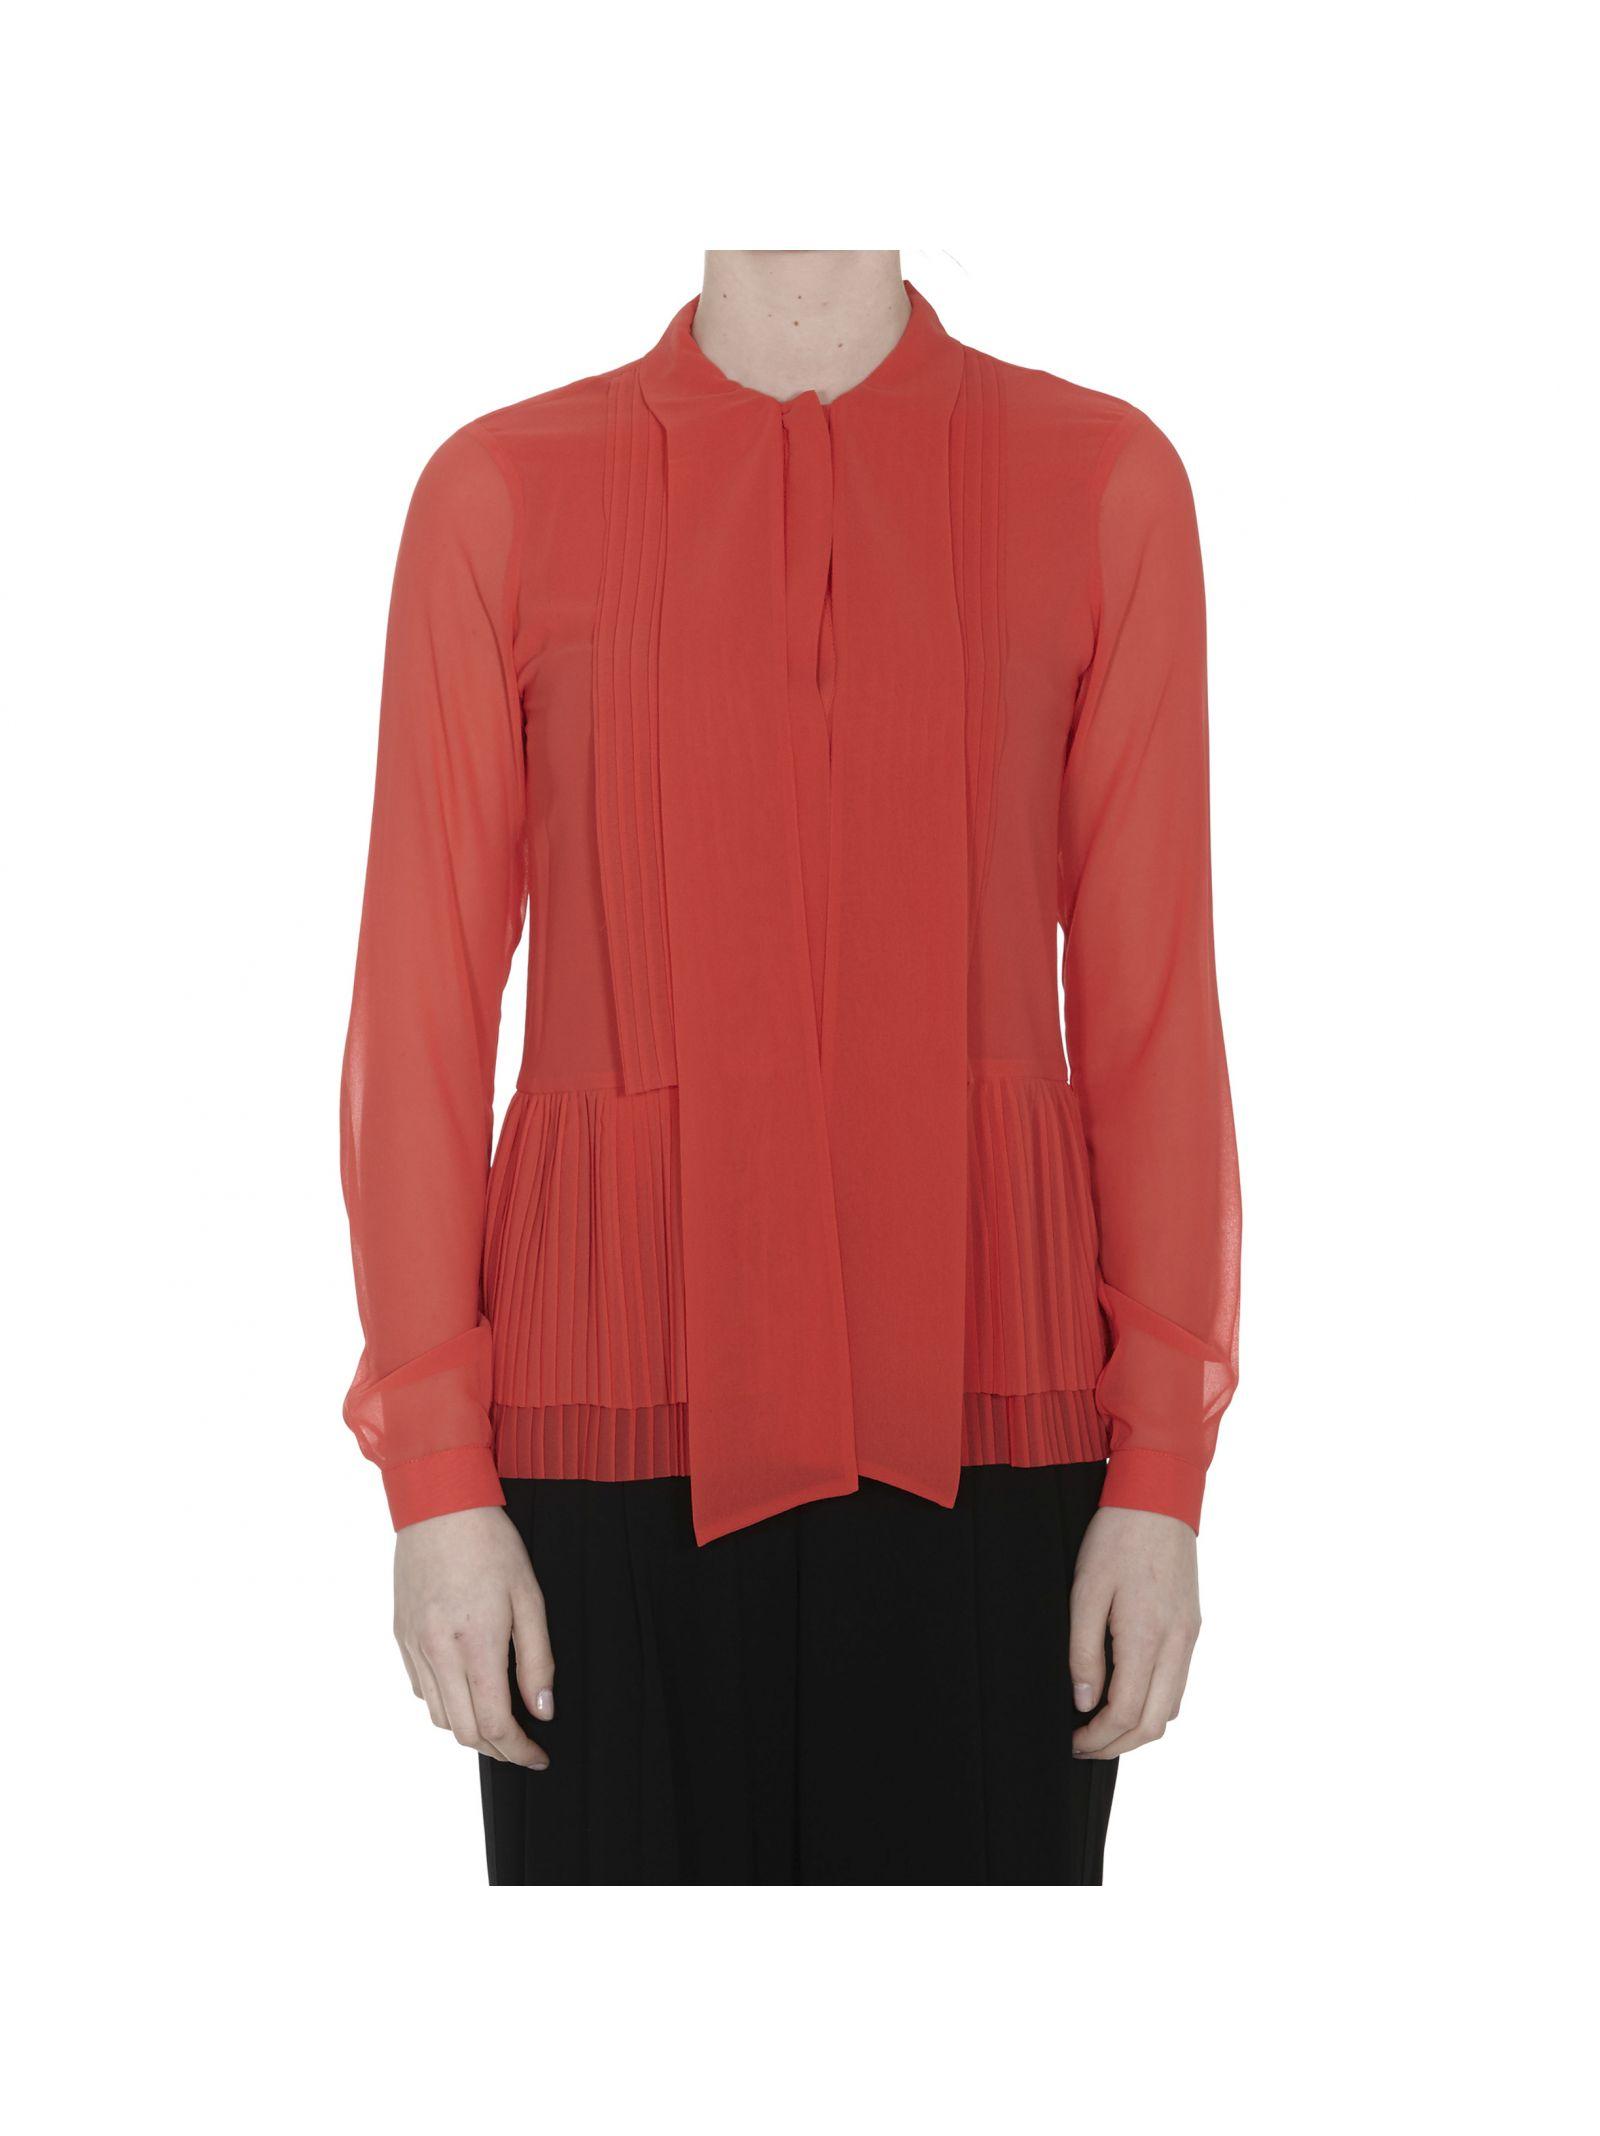 michael kors female michael kors shirt